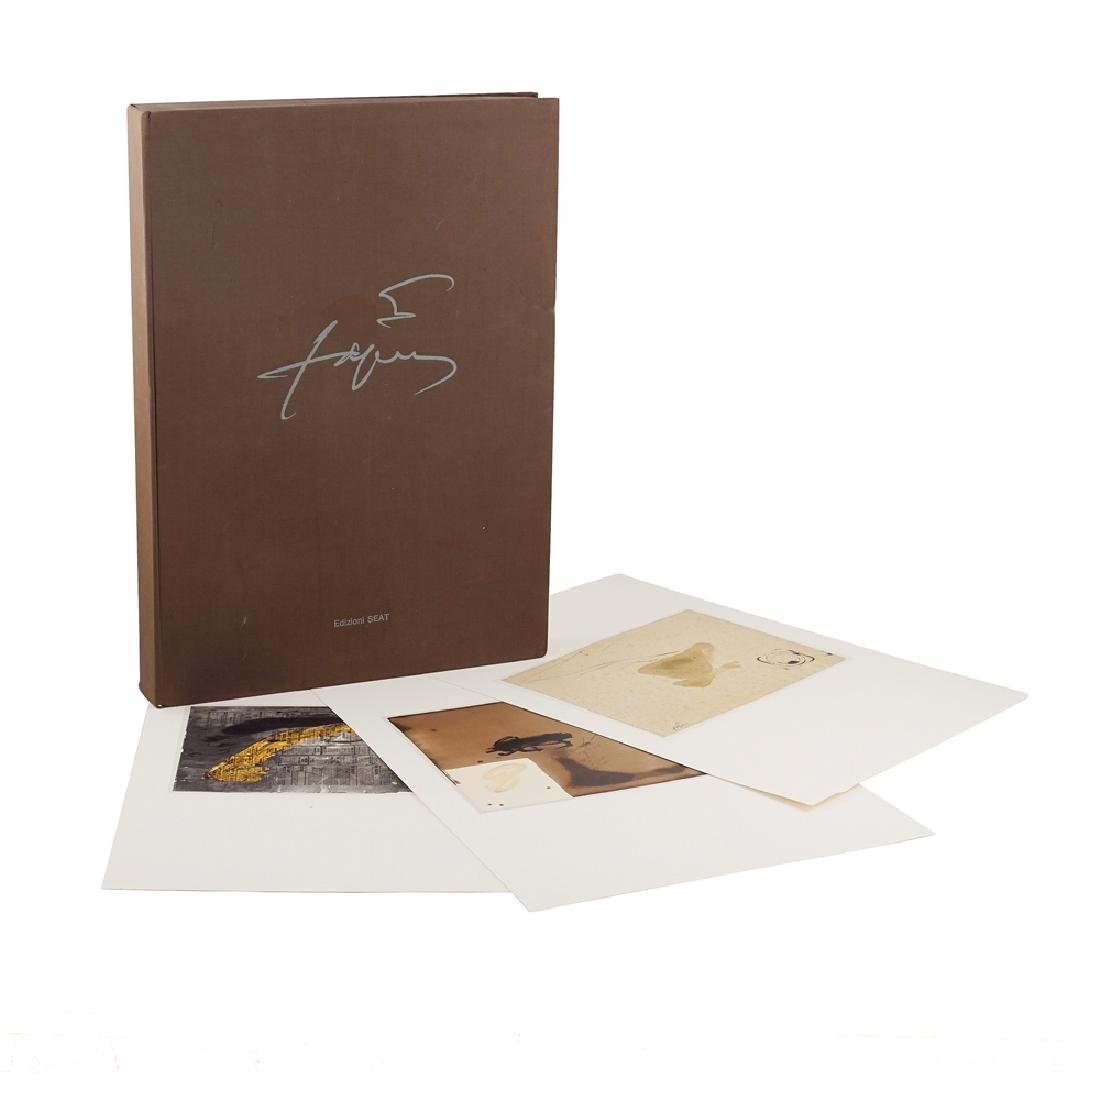 Antoni Tapies Folder Turin 1982 55x40x6 cm.